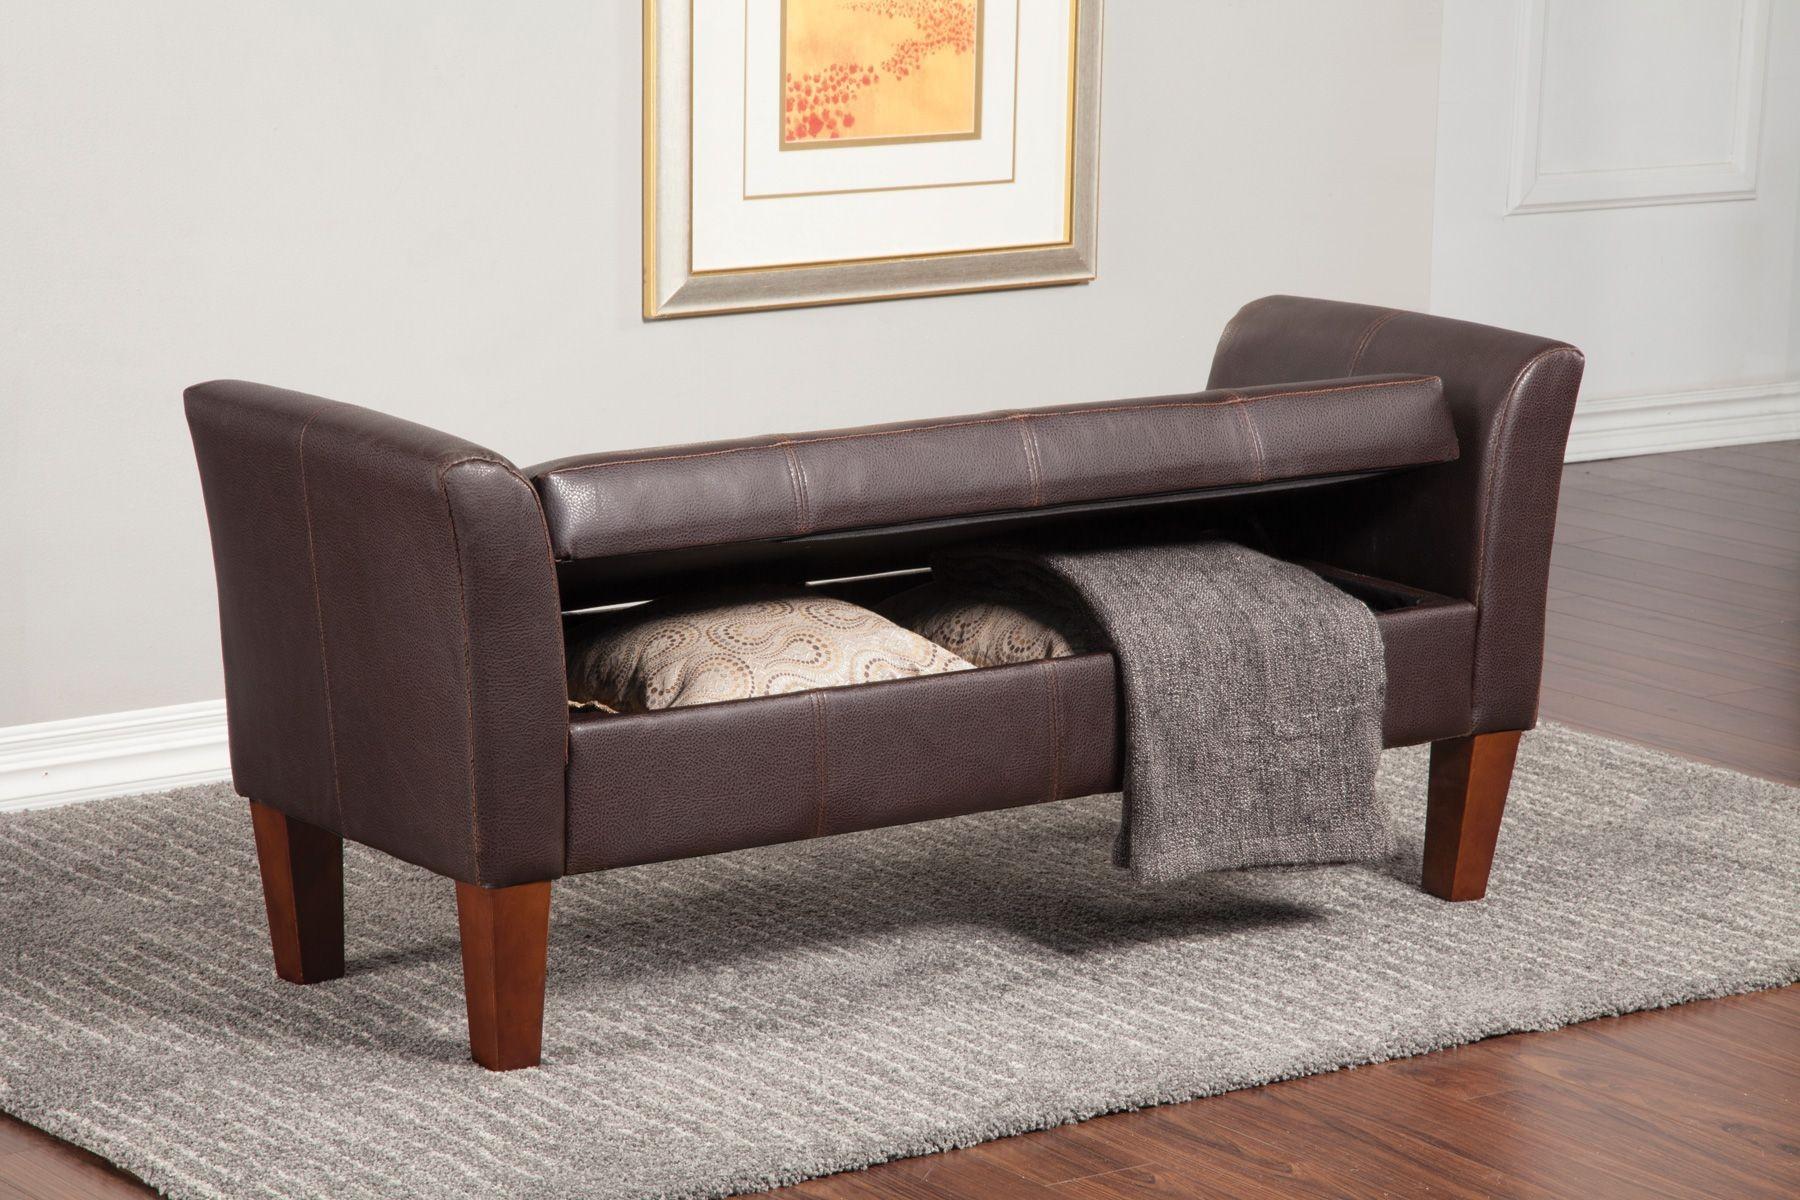 Grey Upholstered Bench 500070 Grey Upholstered Bench From Coaster 500070